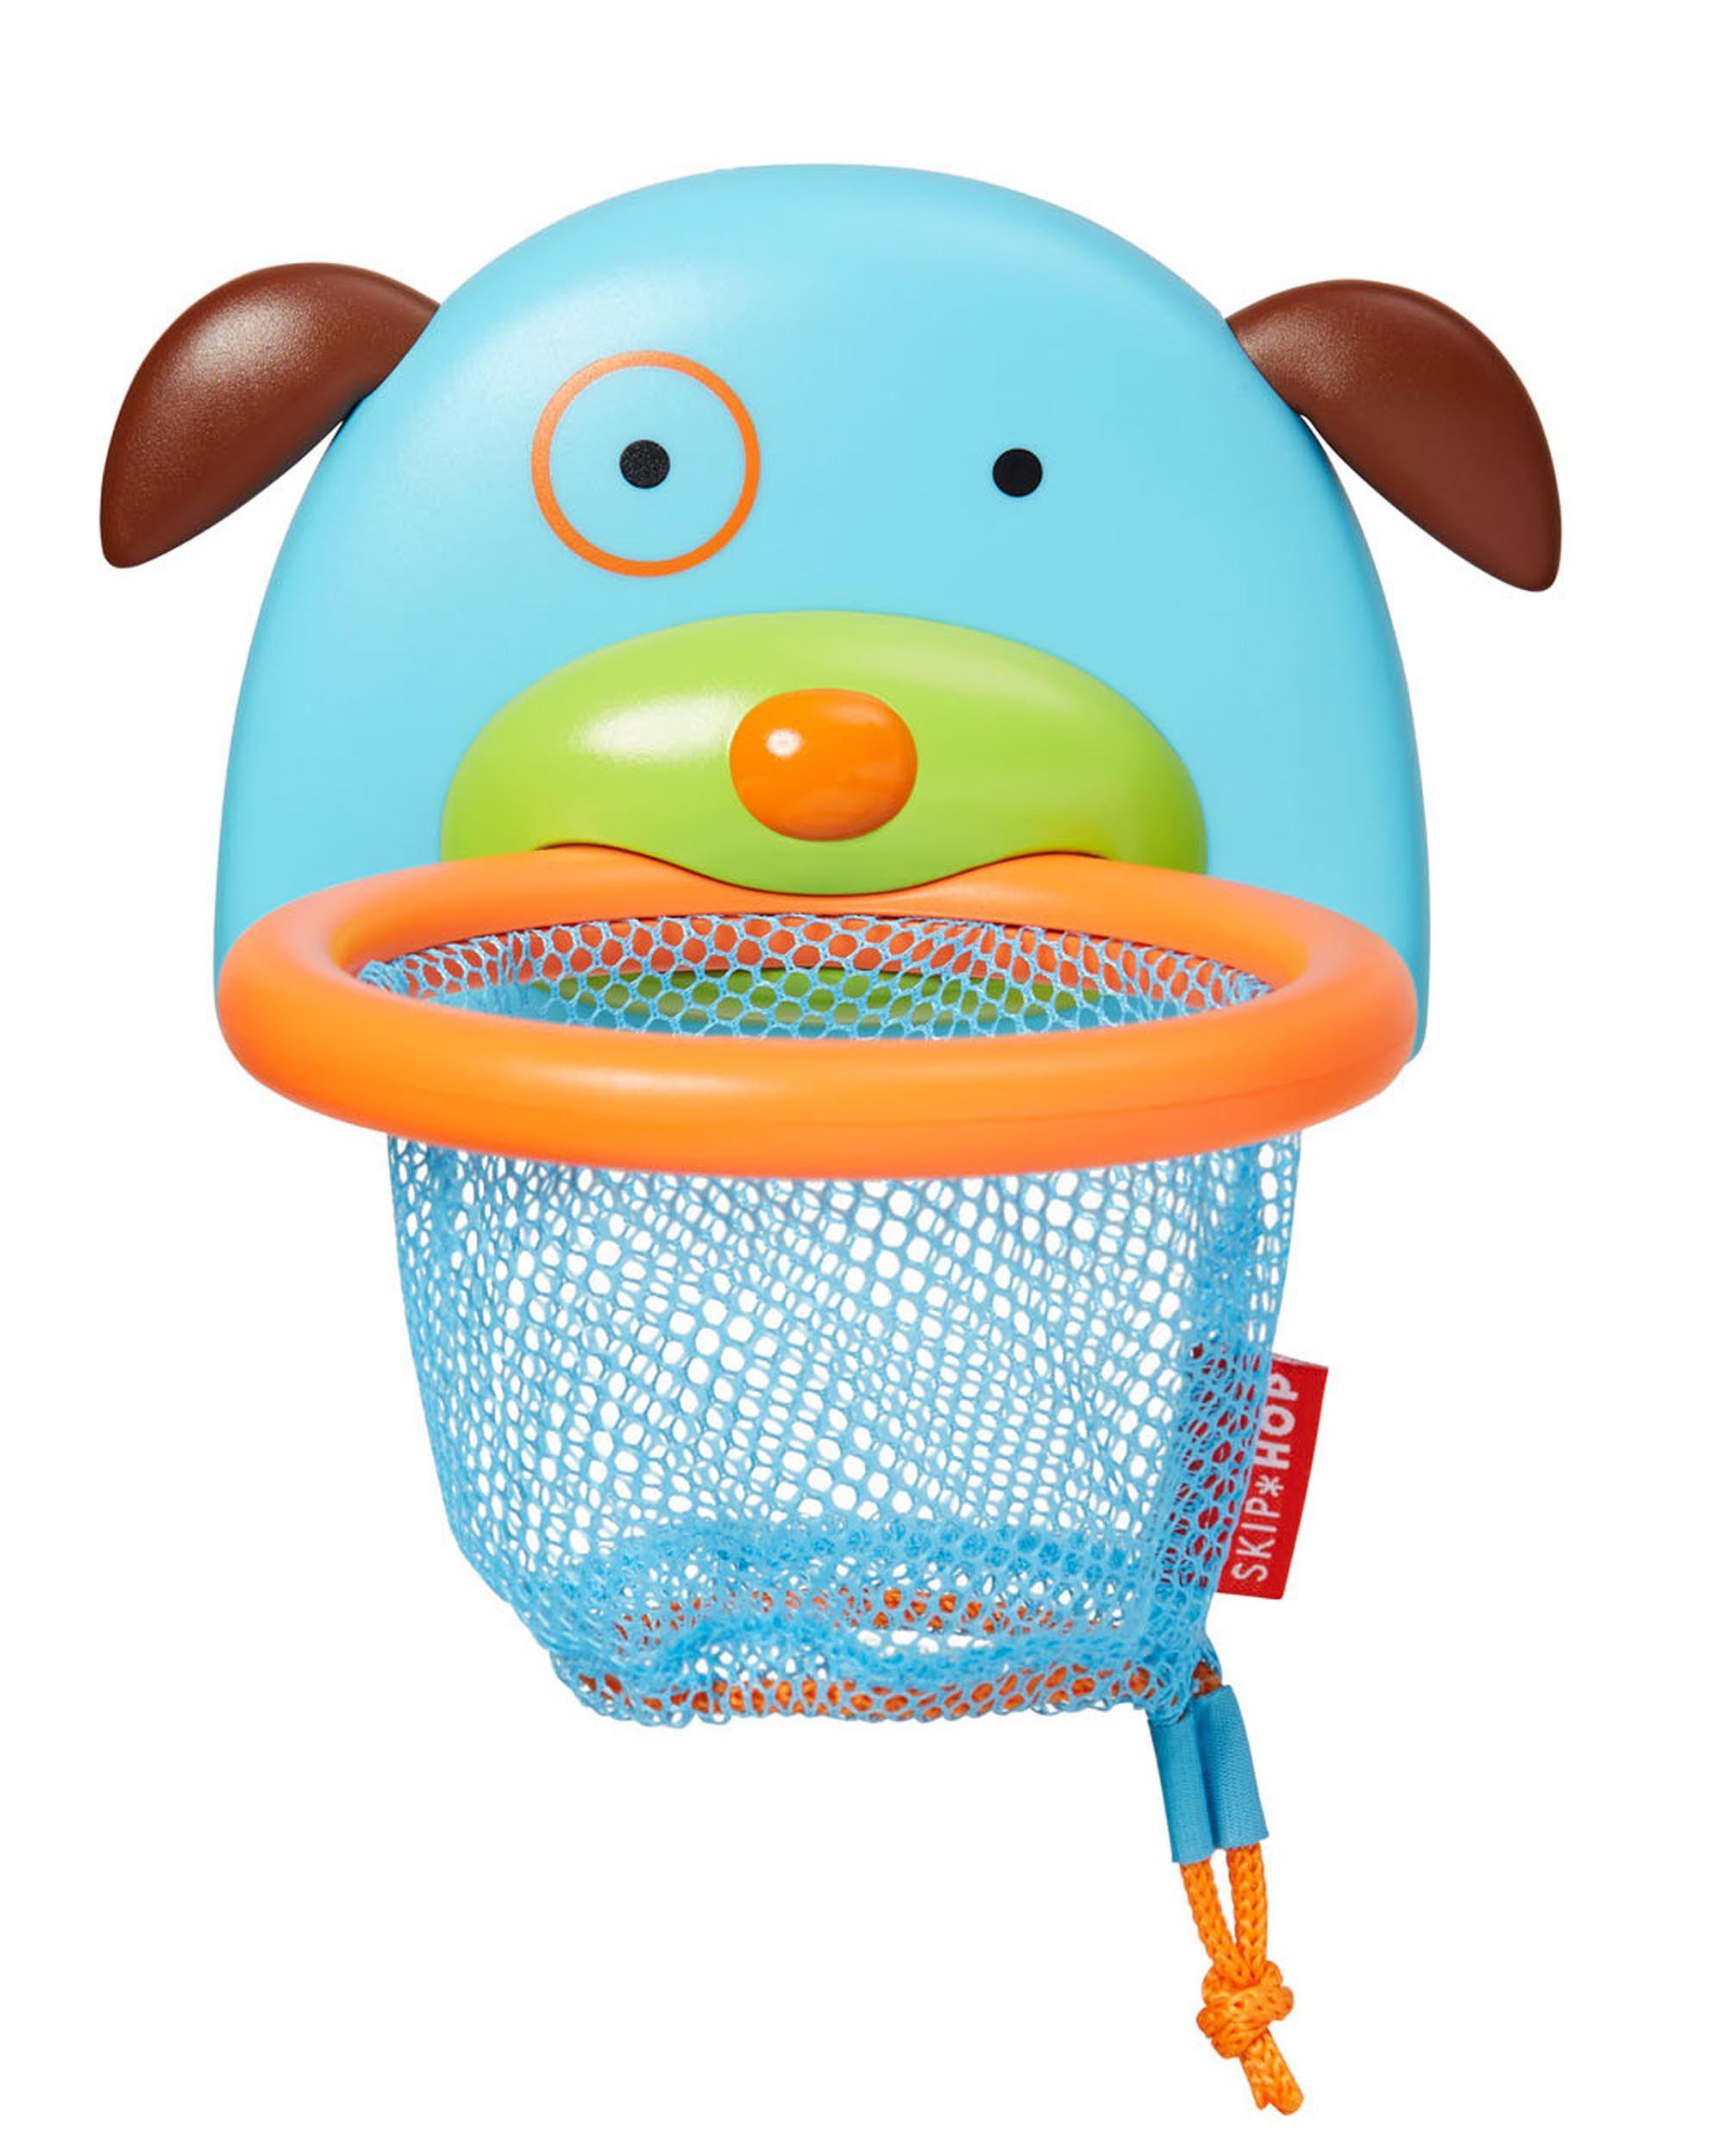 Oshkoshbgosh Zoo Bathtime Basketball